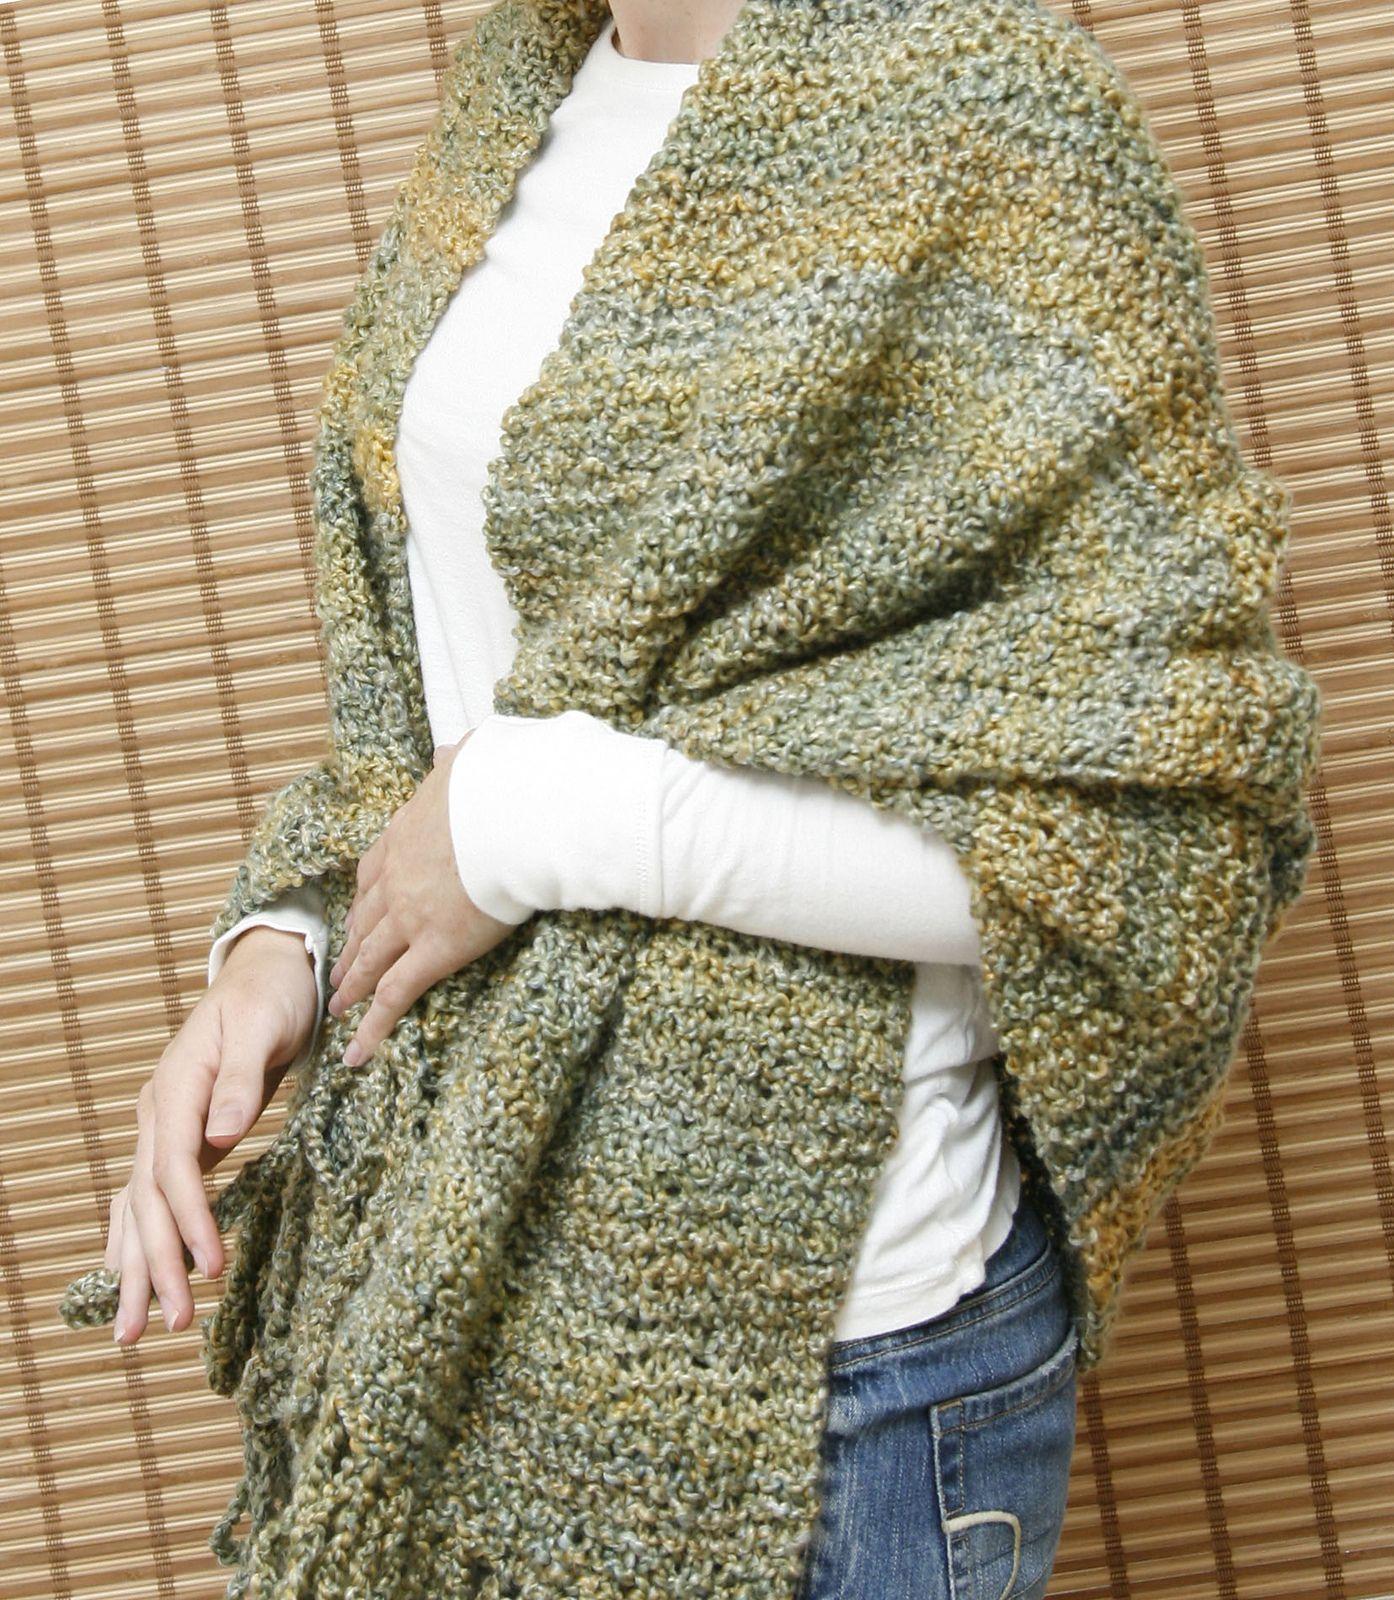 Ravelry: Prayer Shawl / Healing Shawl #20281-K (Knit) by Victoria ...